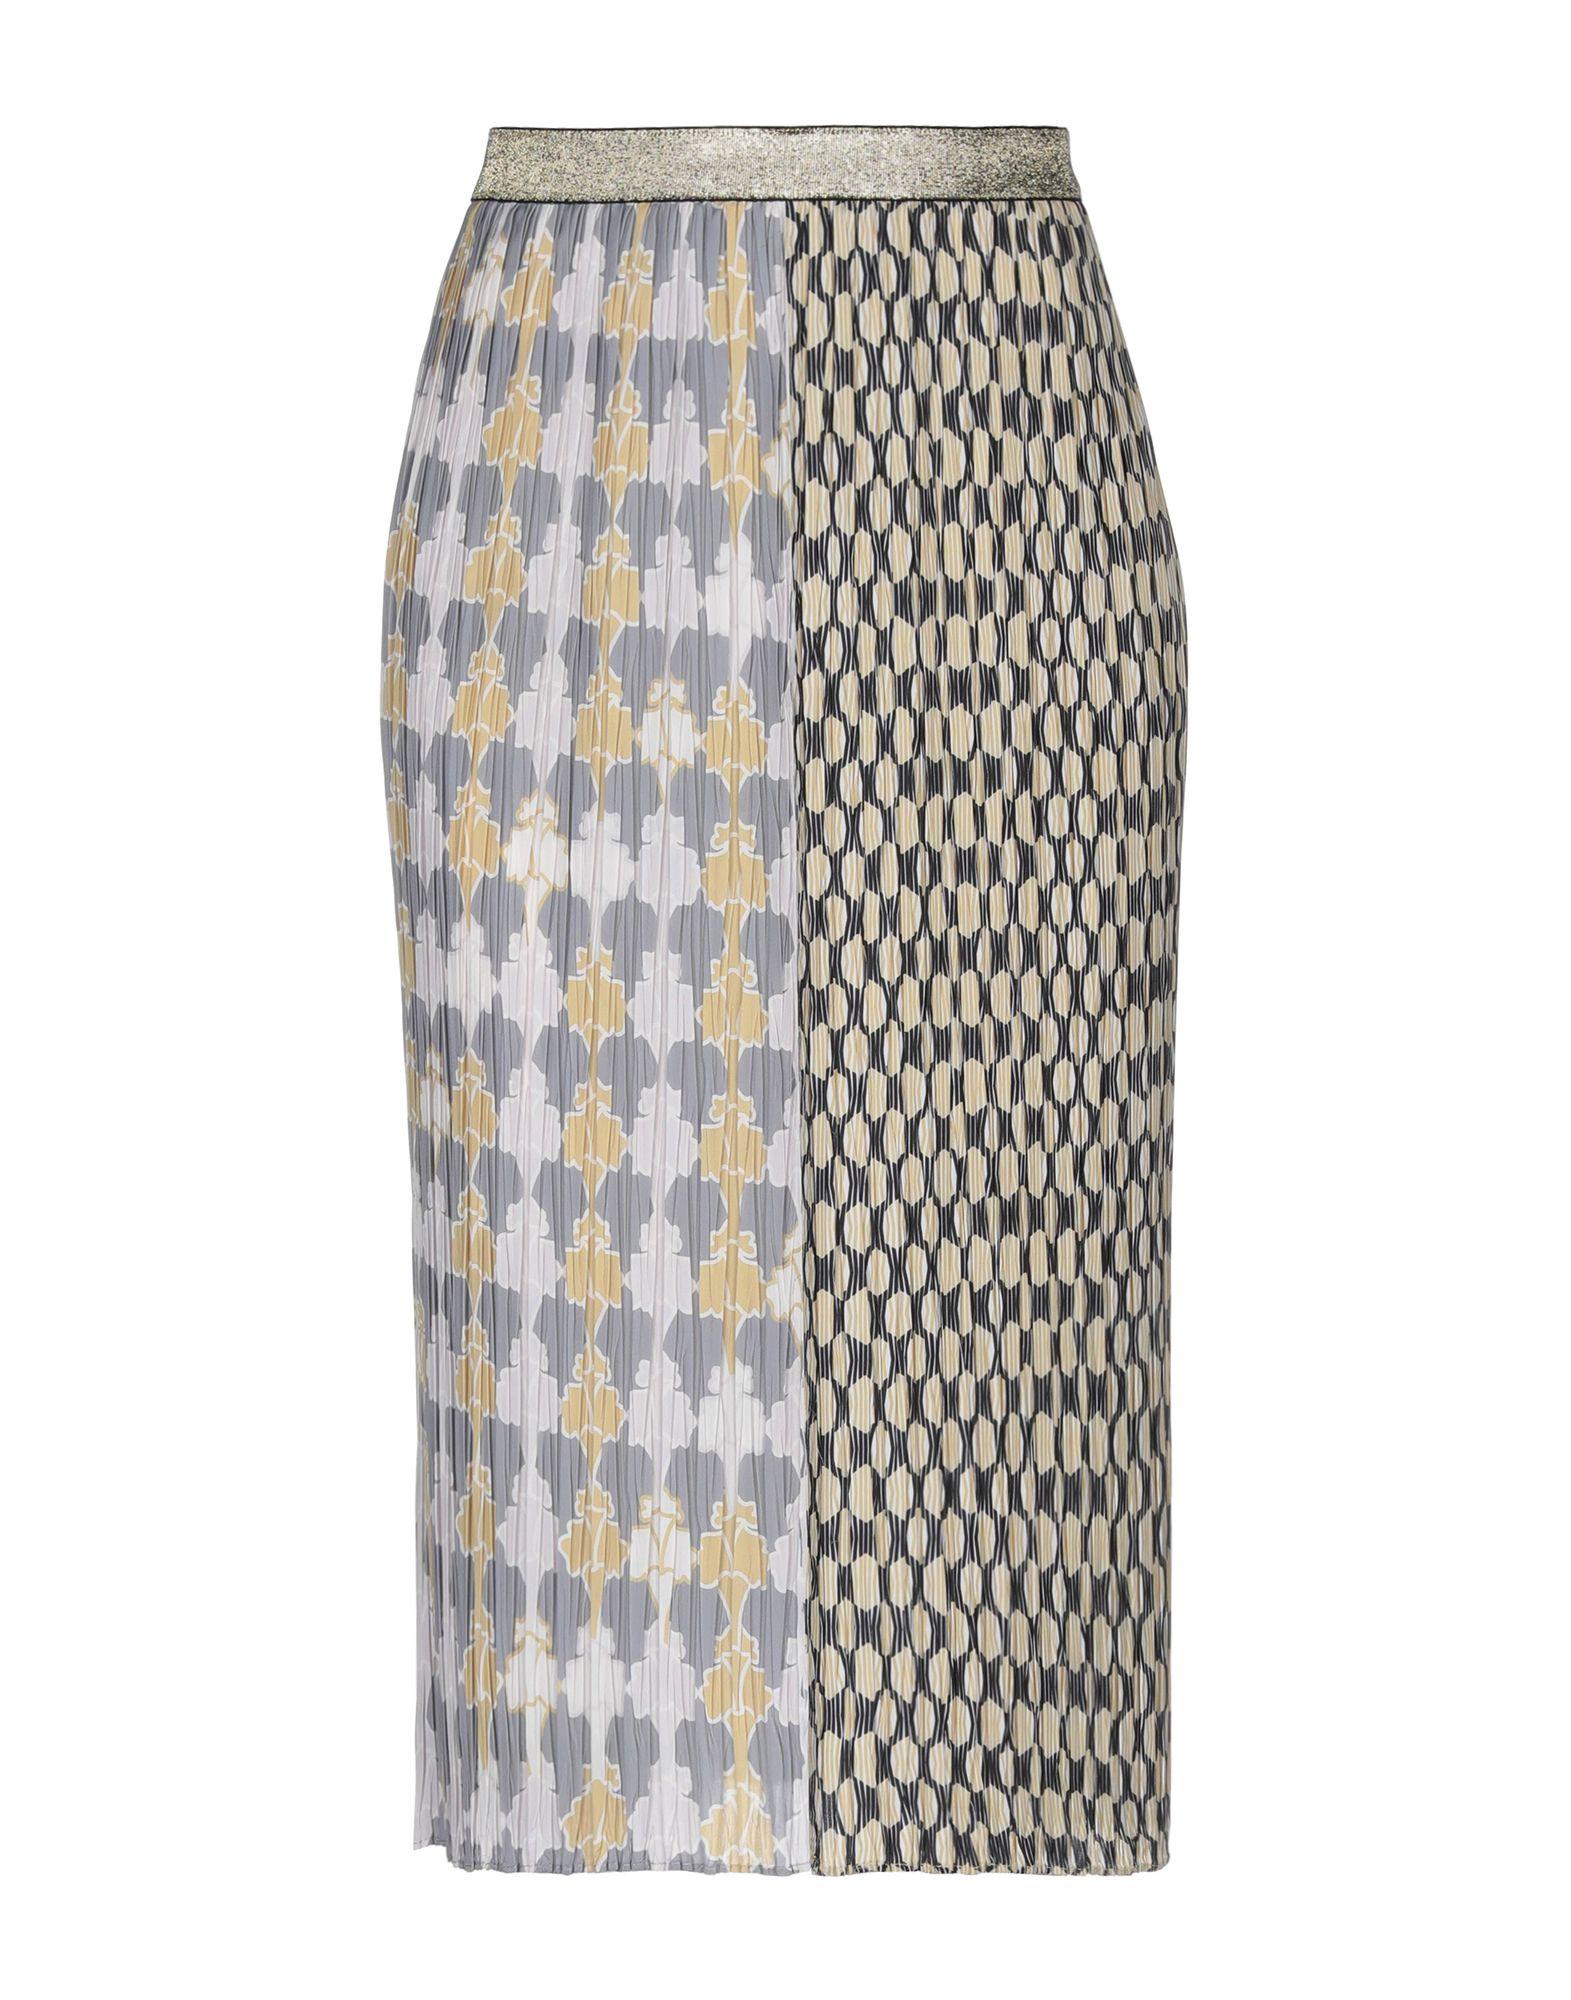 KATIA G. Юбка длиной 3/4 g na юбка длиной 3 4